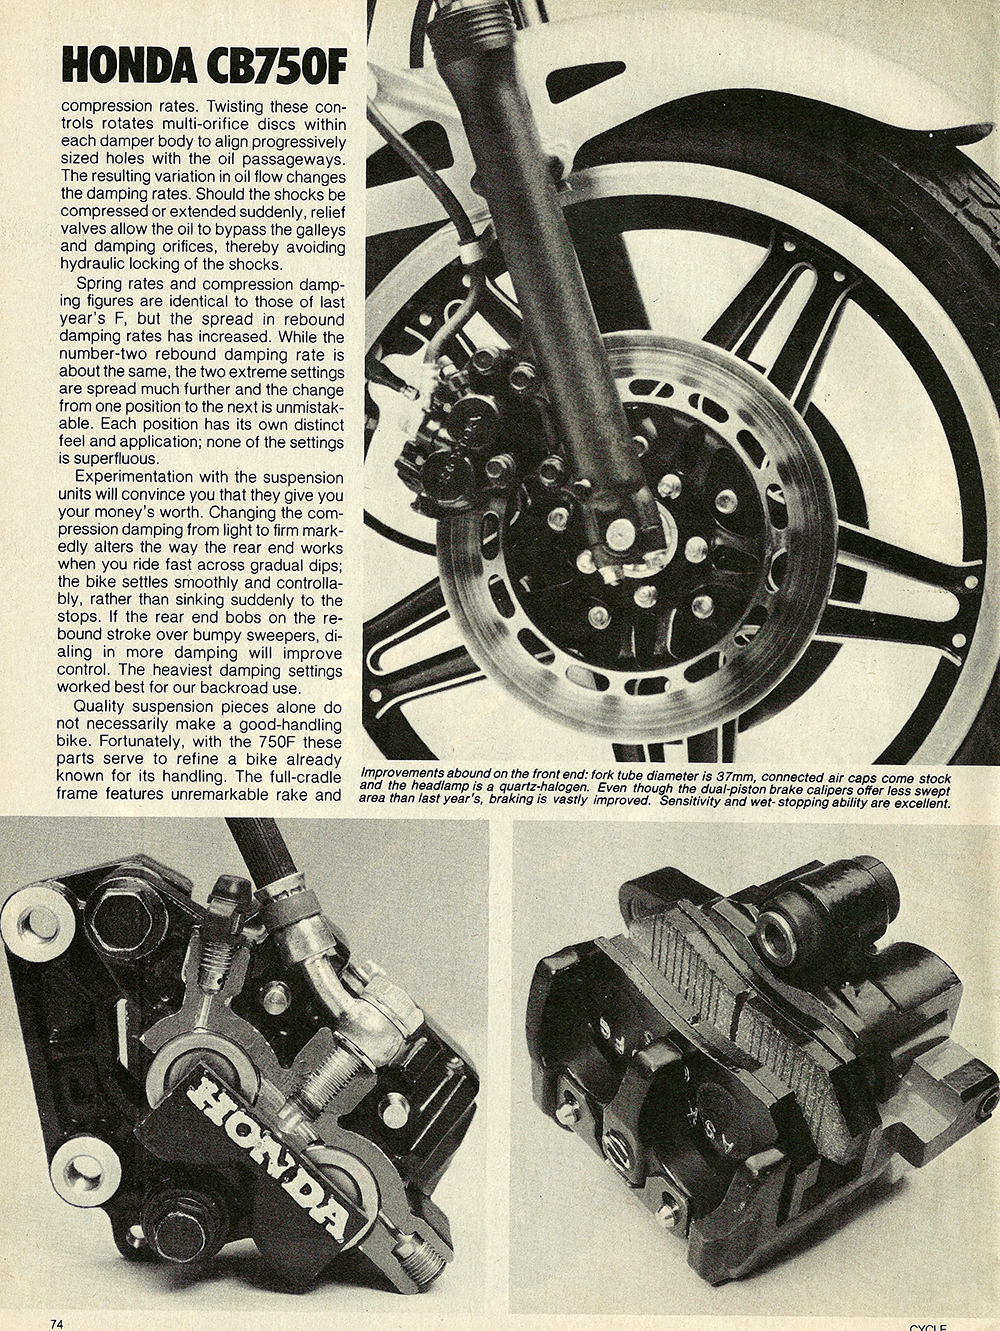 1980 Honda CB750F road test 03.jpg